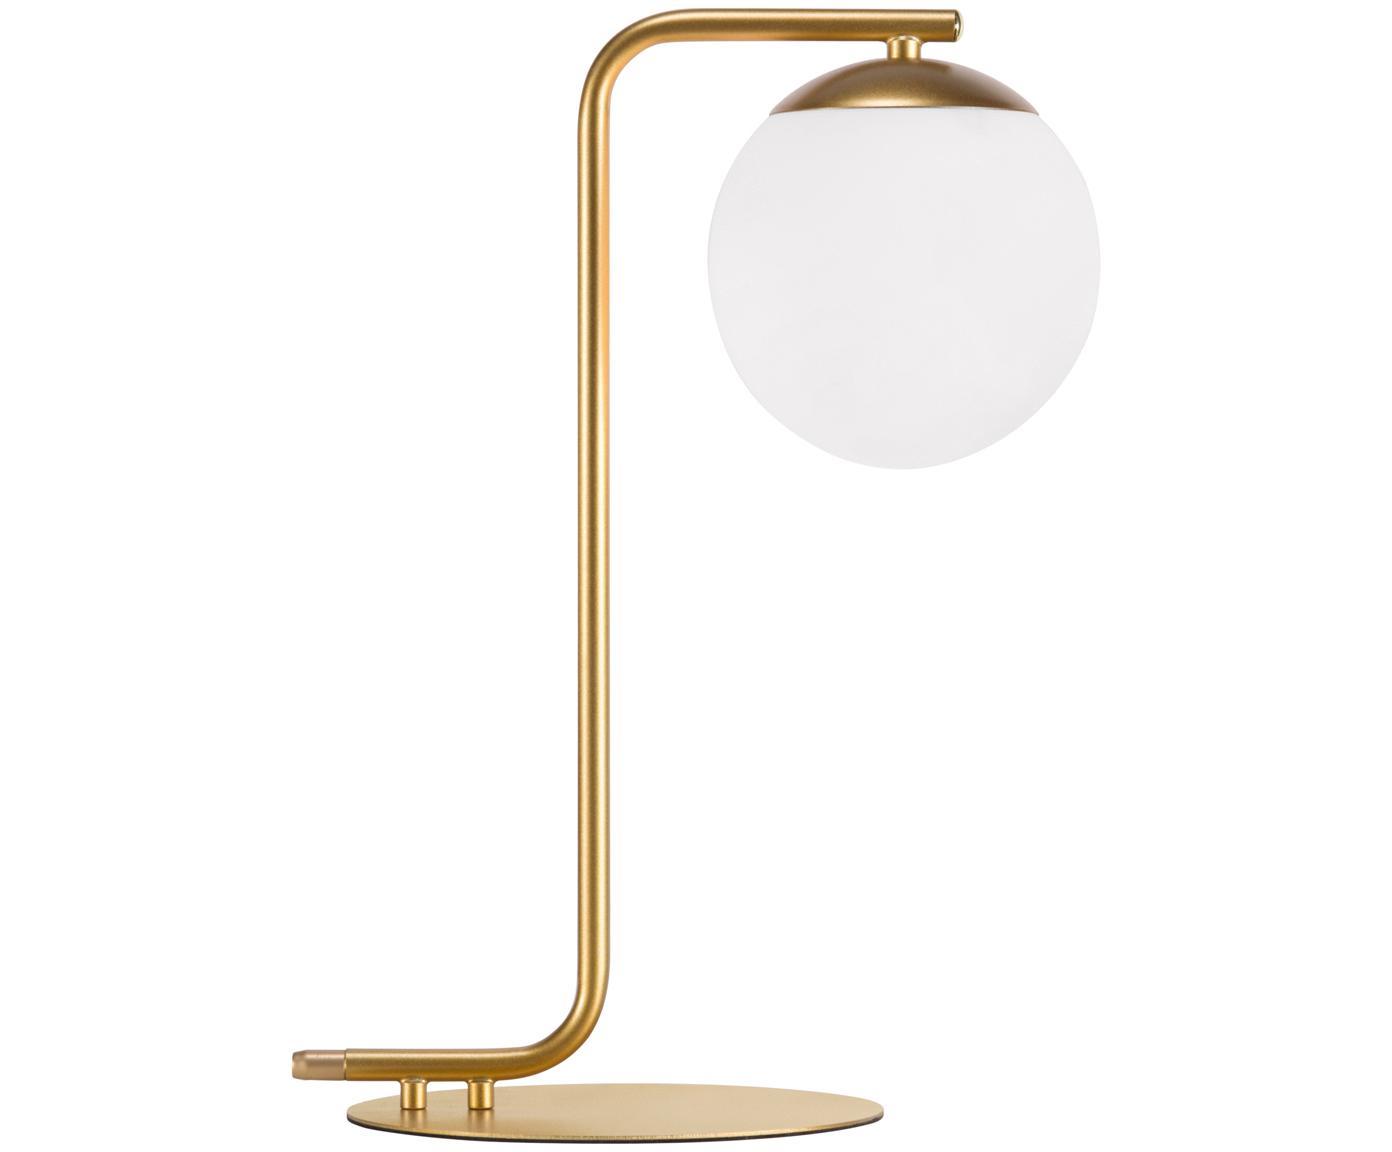 Lámpara de mesa Grant, Base de la lámpara: latón, Pantalla: vidrio opalino, Latón, blanco, An 20 x Al 41 cm